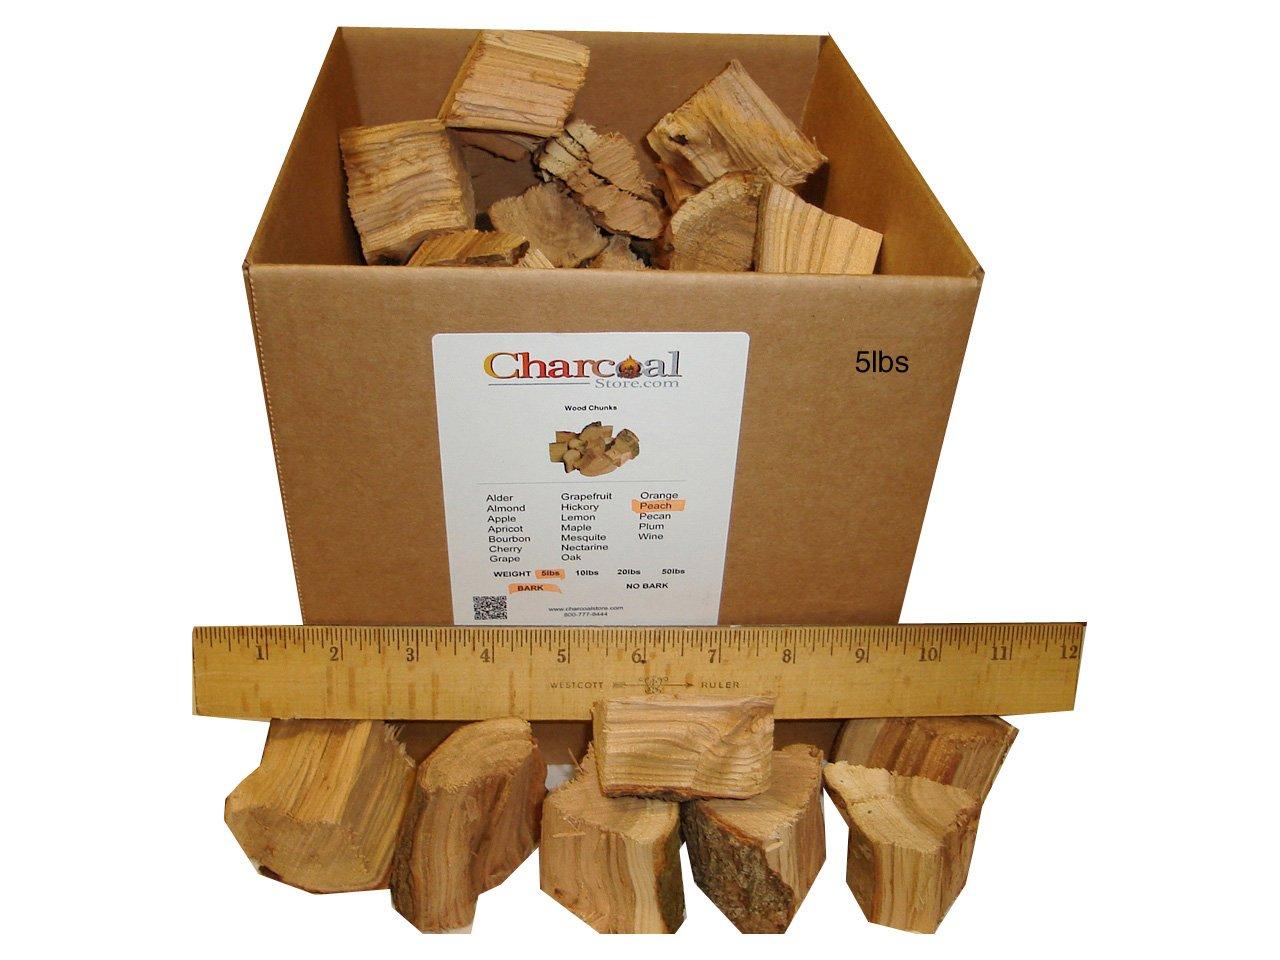 CharcoalStore Peach Wood Smoking Chunks (5 pounds) by CharcoalStore